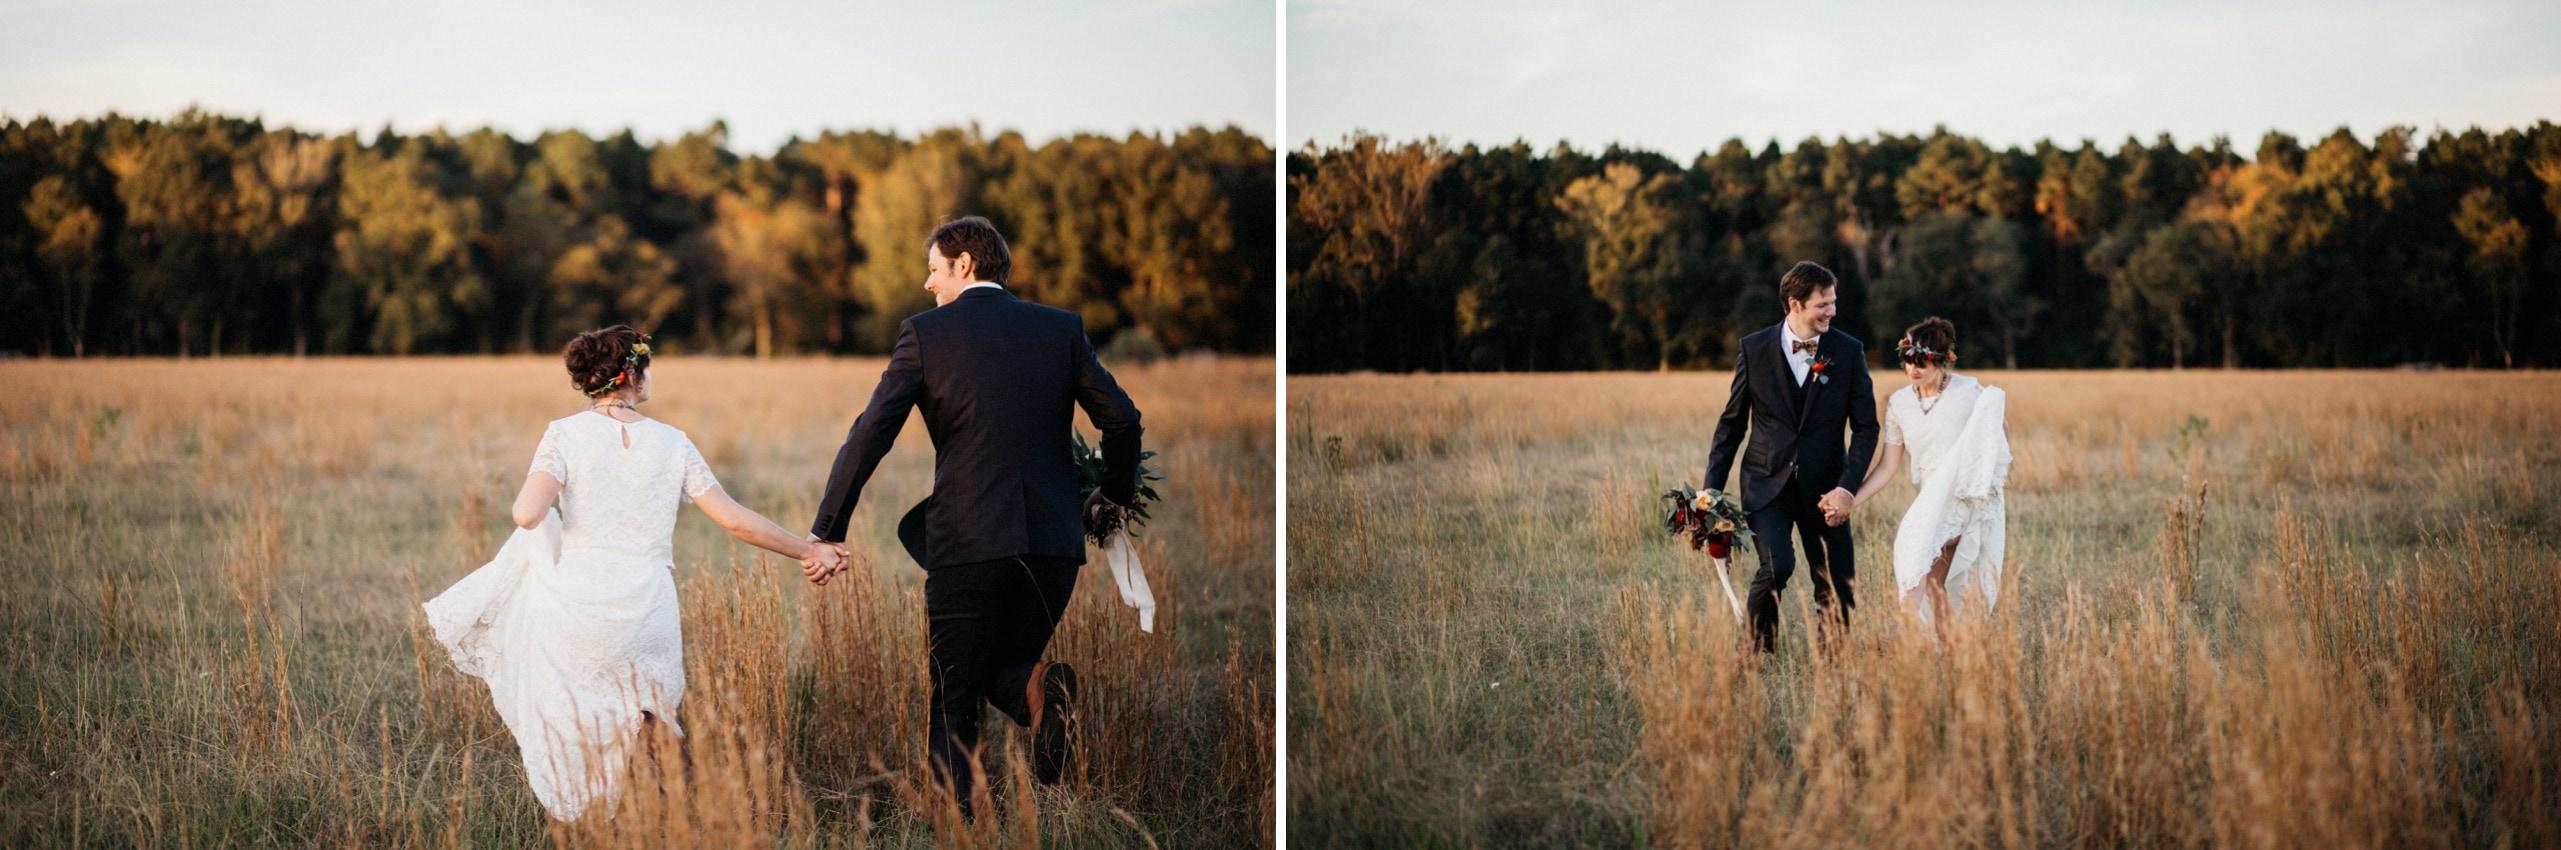 Southern_Surprise_Wedding_0119